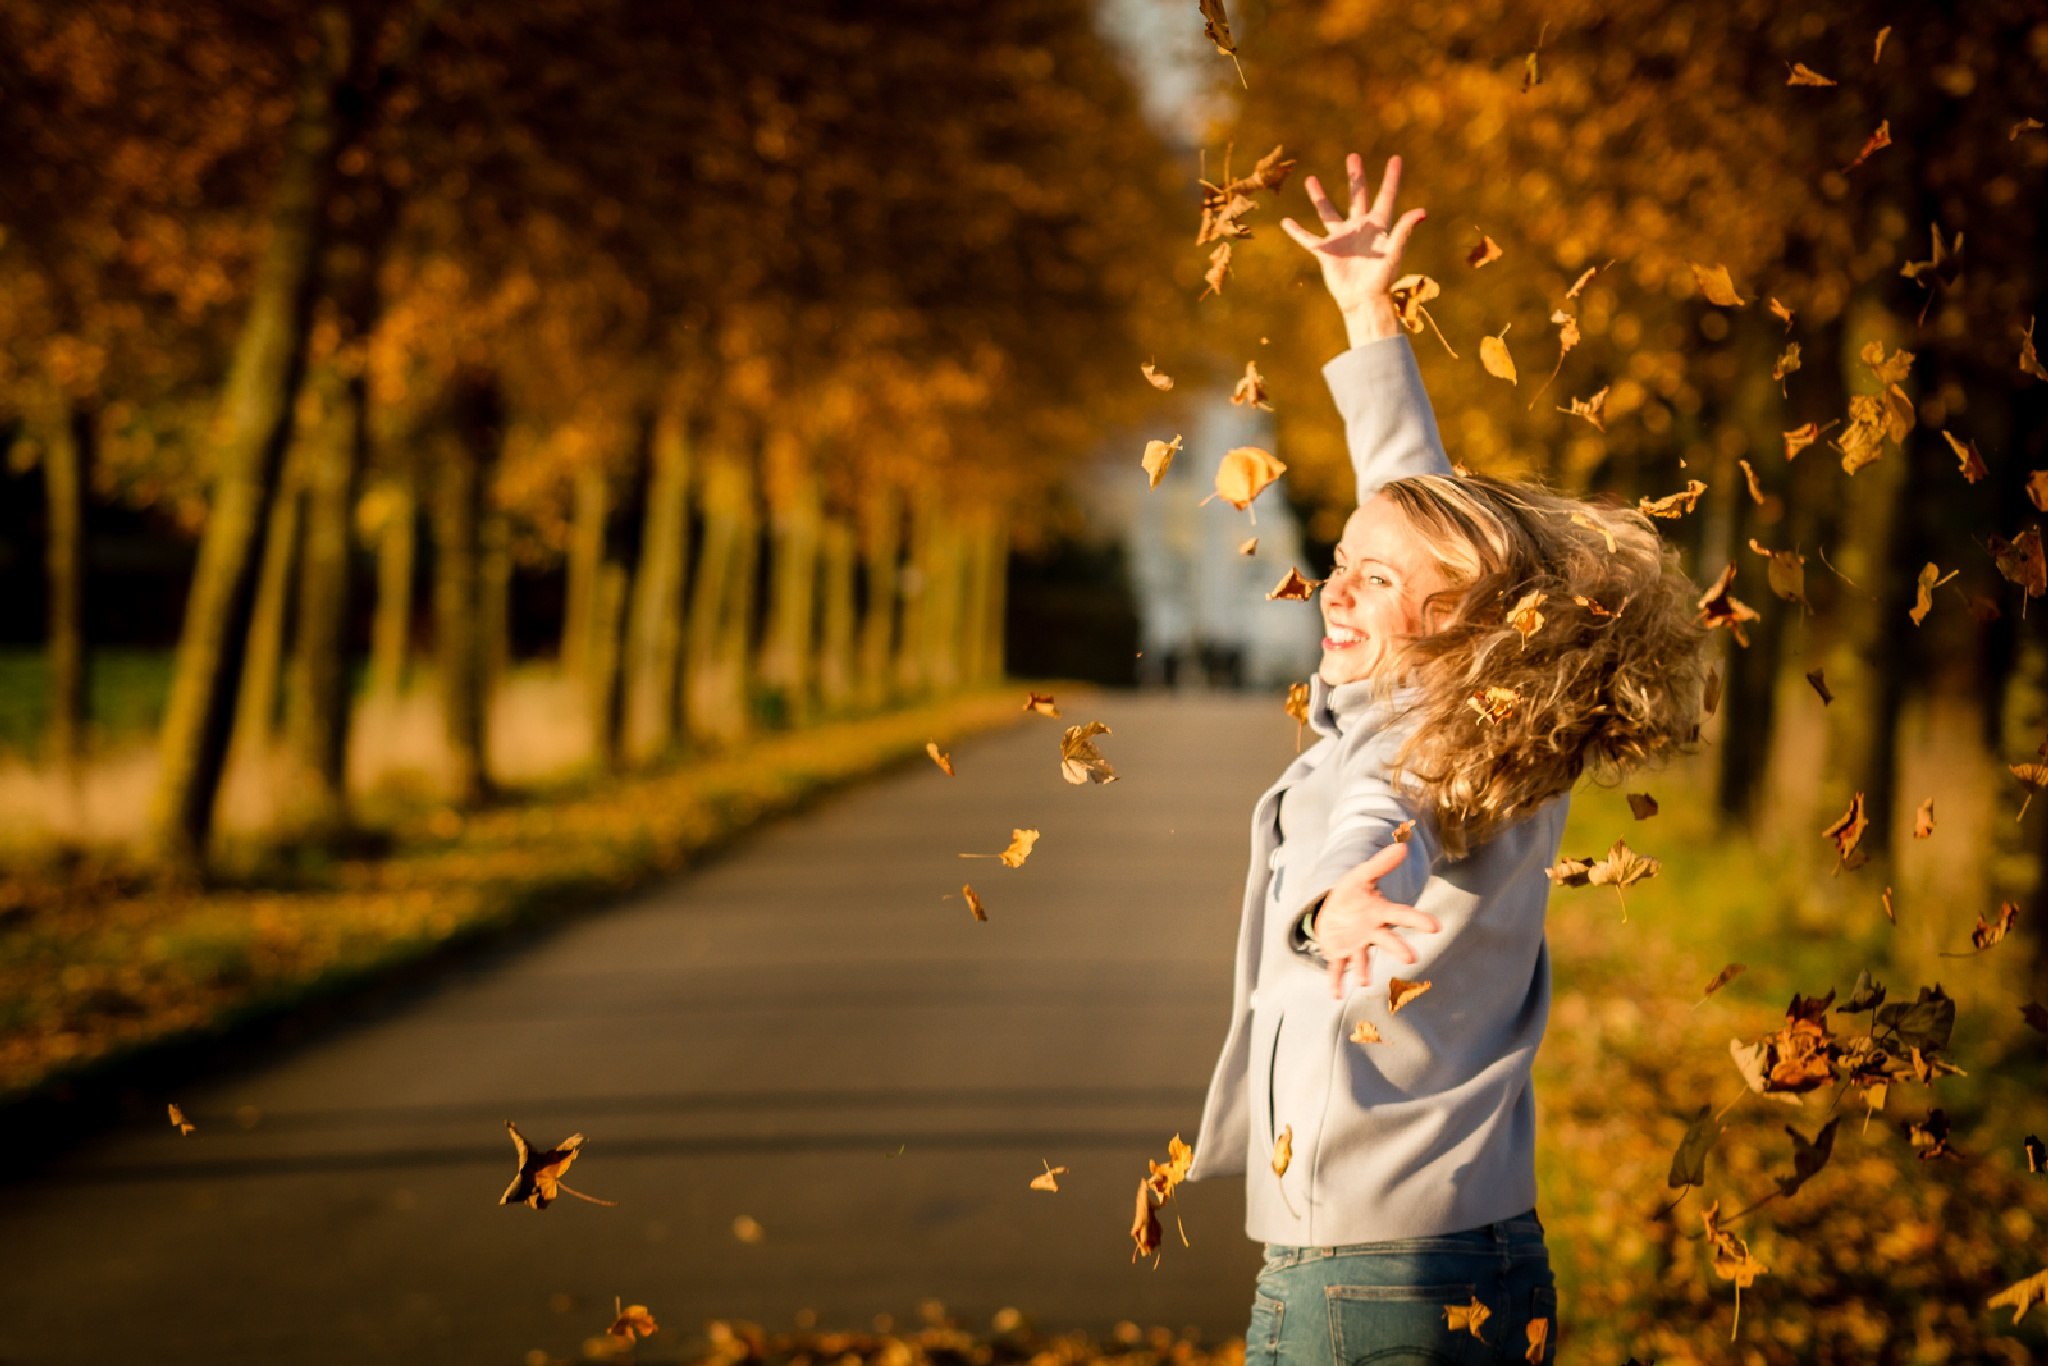 Autumn Dance #3 by jorg.fischer.10